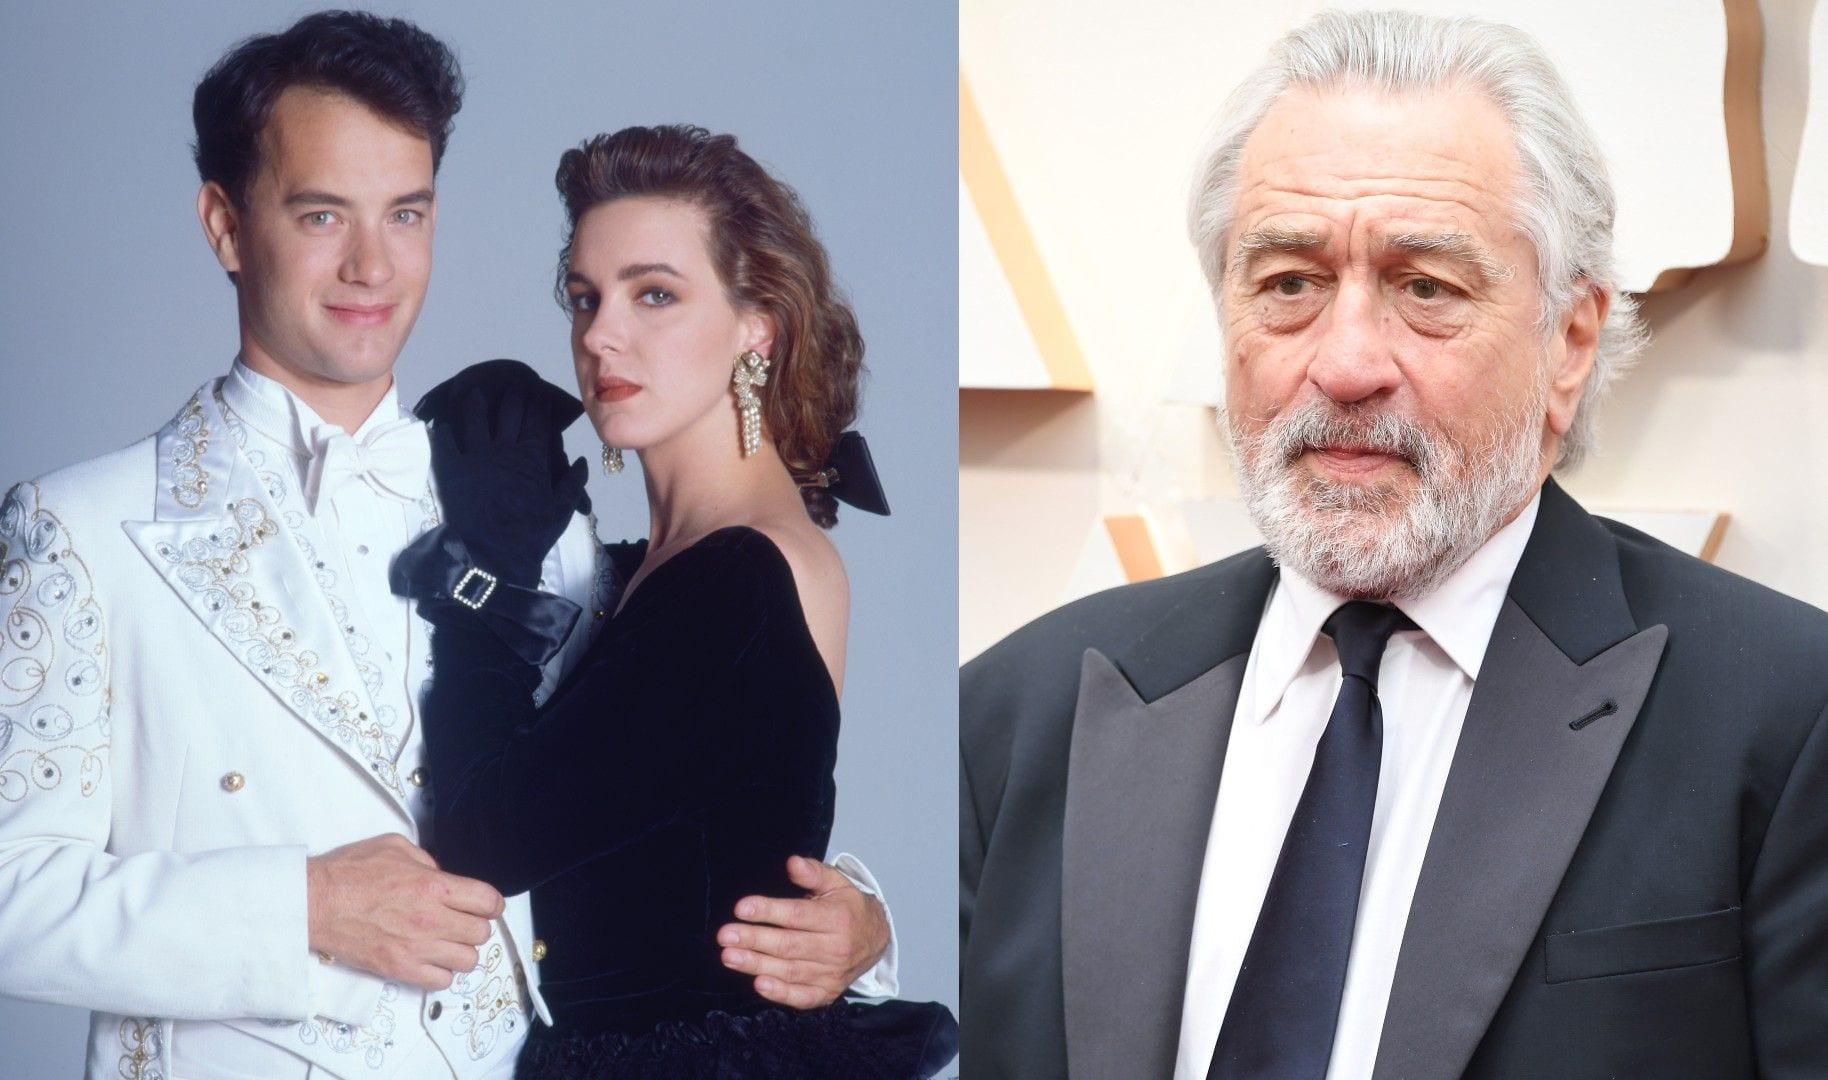 Robert De Niro, Big